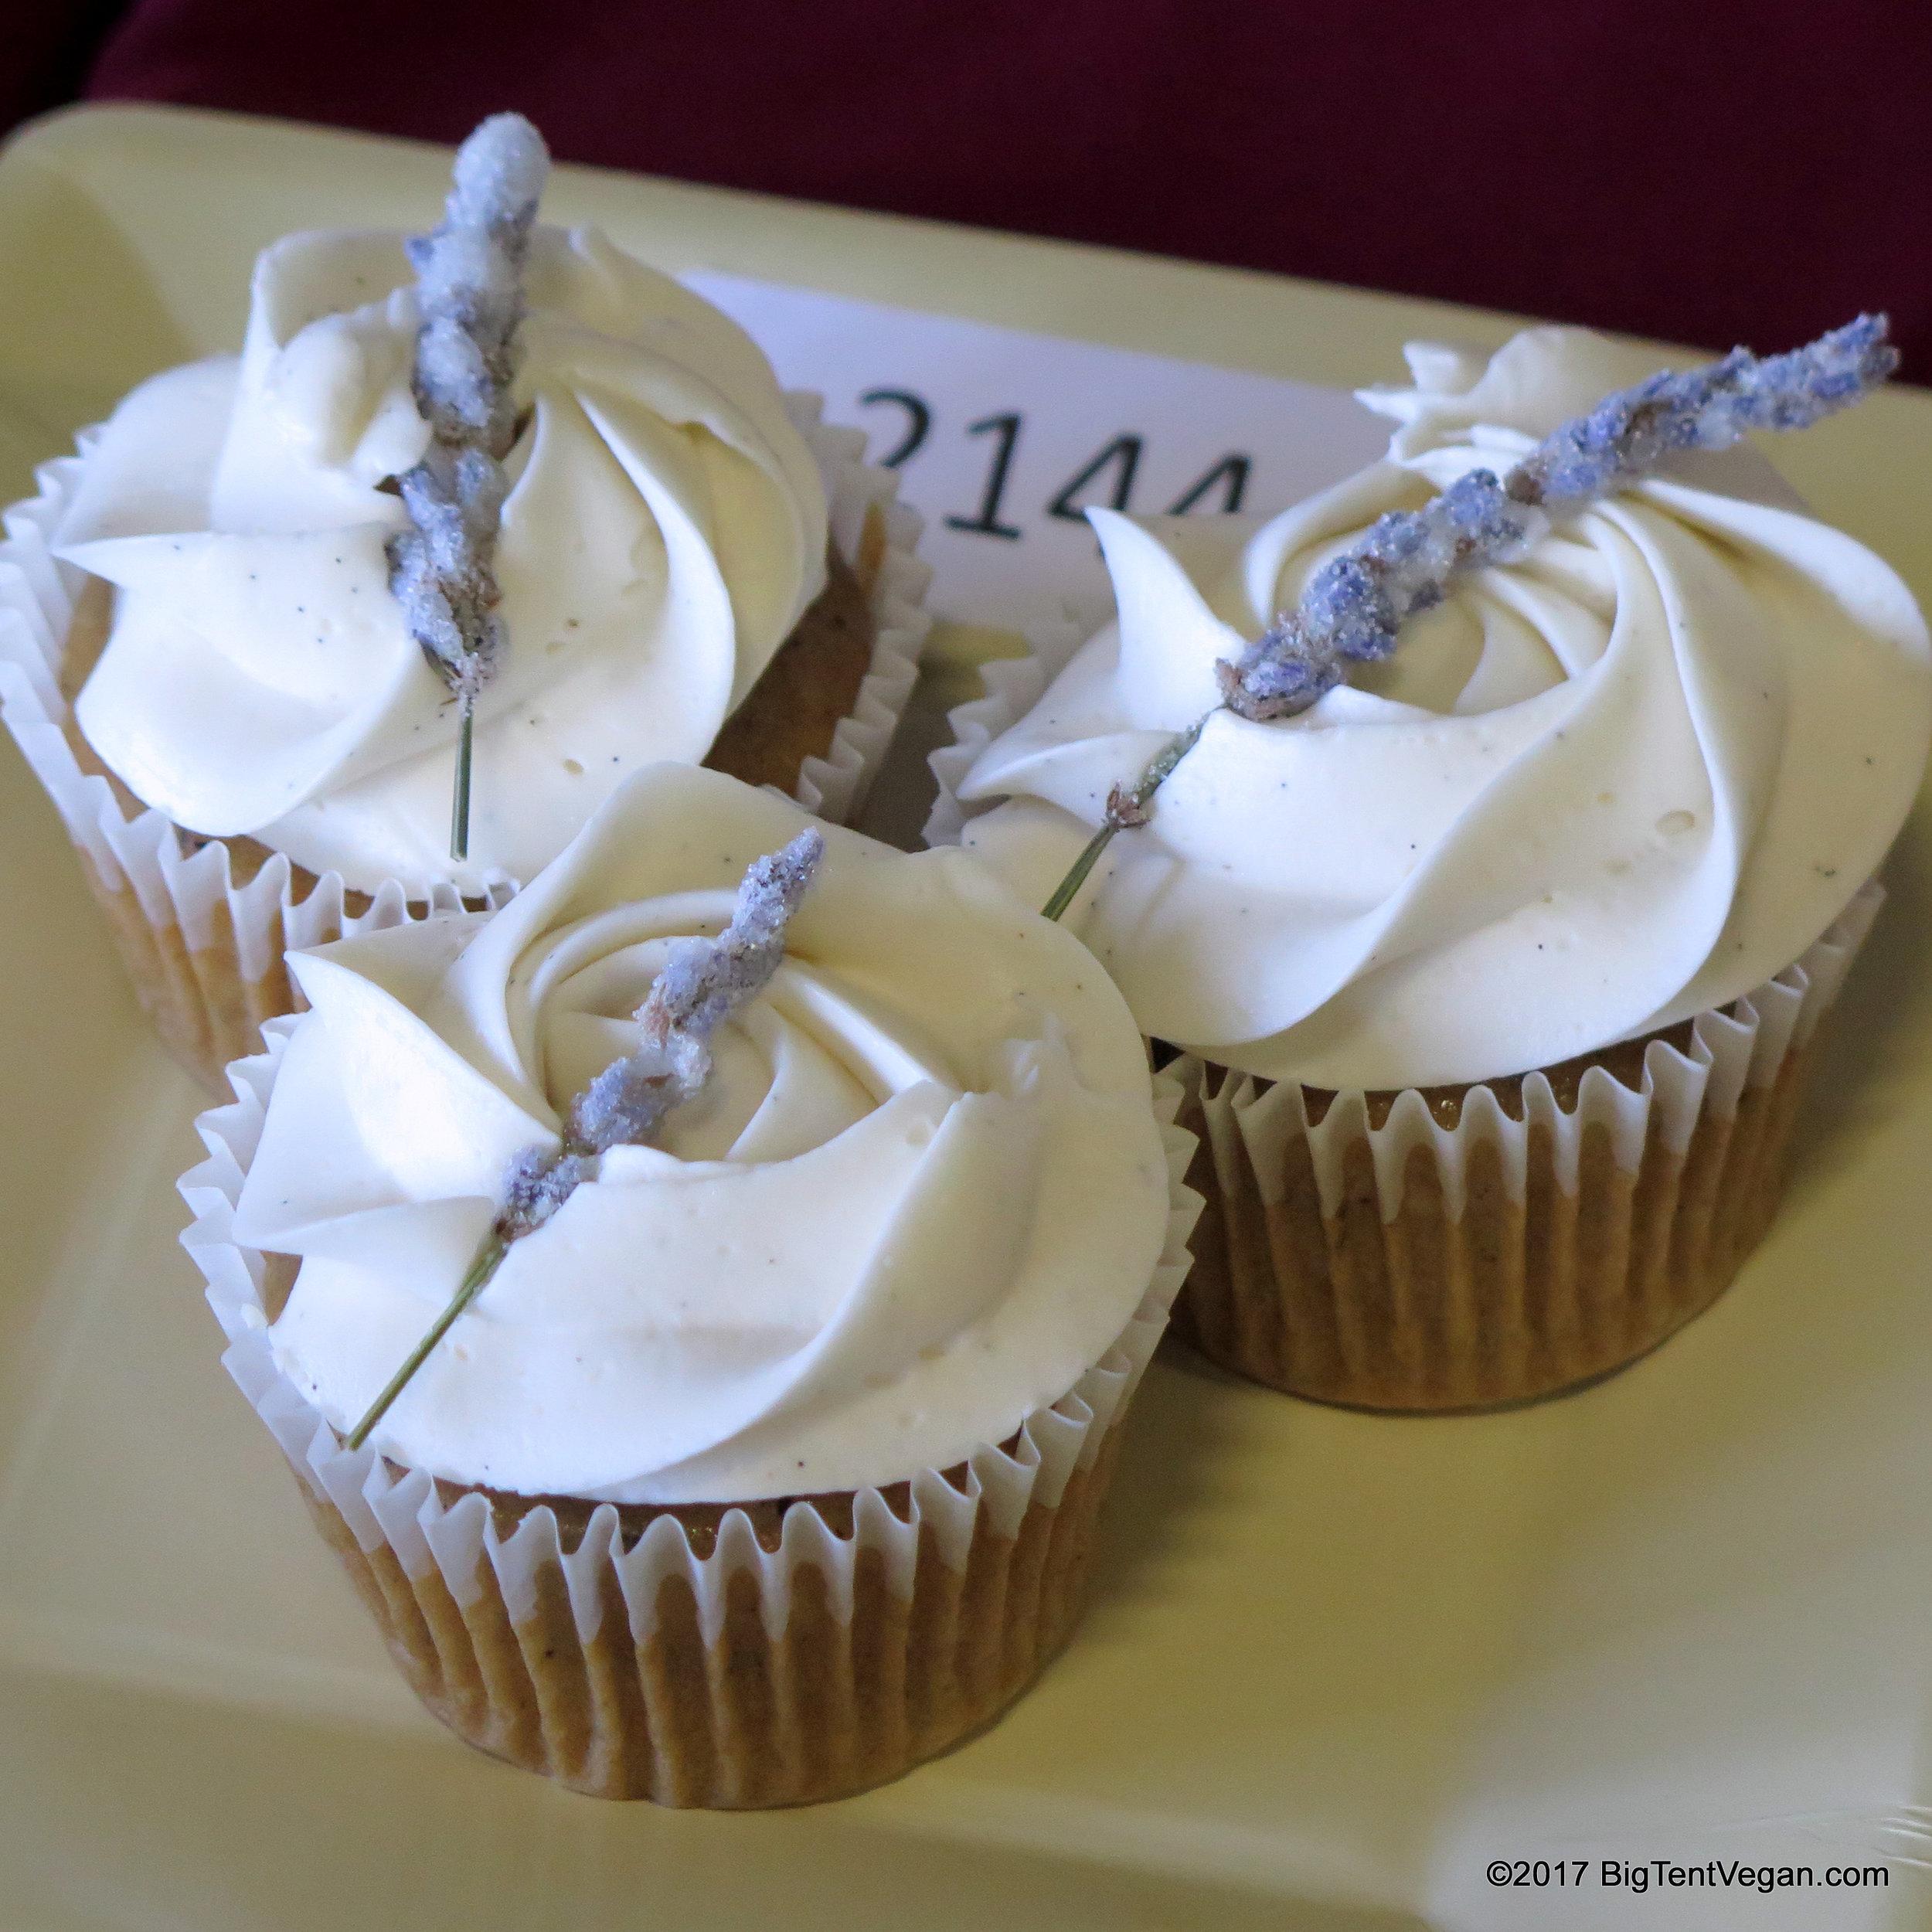 1st Place: Leanne Winslow -- Vanilla Earl Grey Cupcakes with Lavender Vanilla Swiss Meringue Buttercream